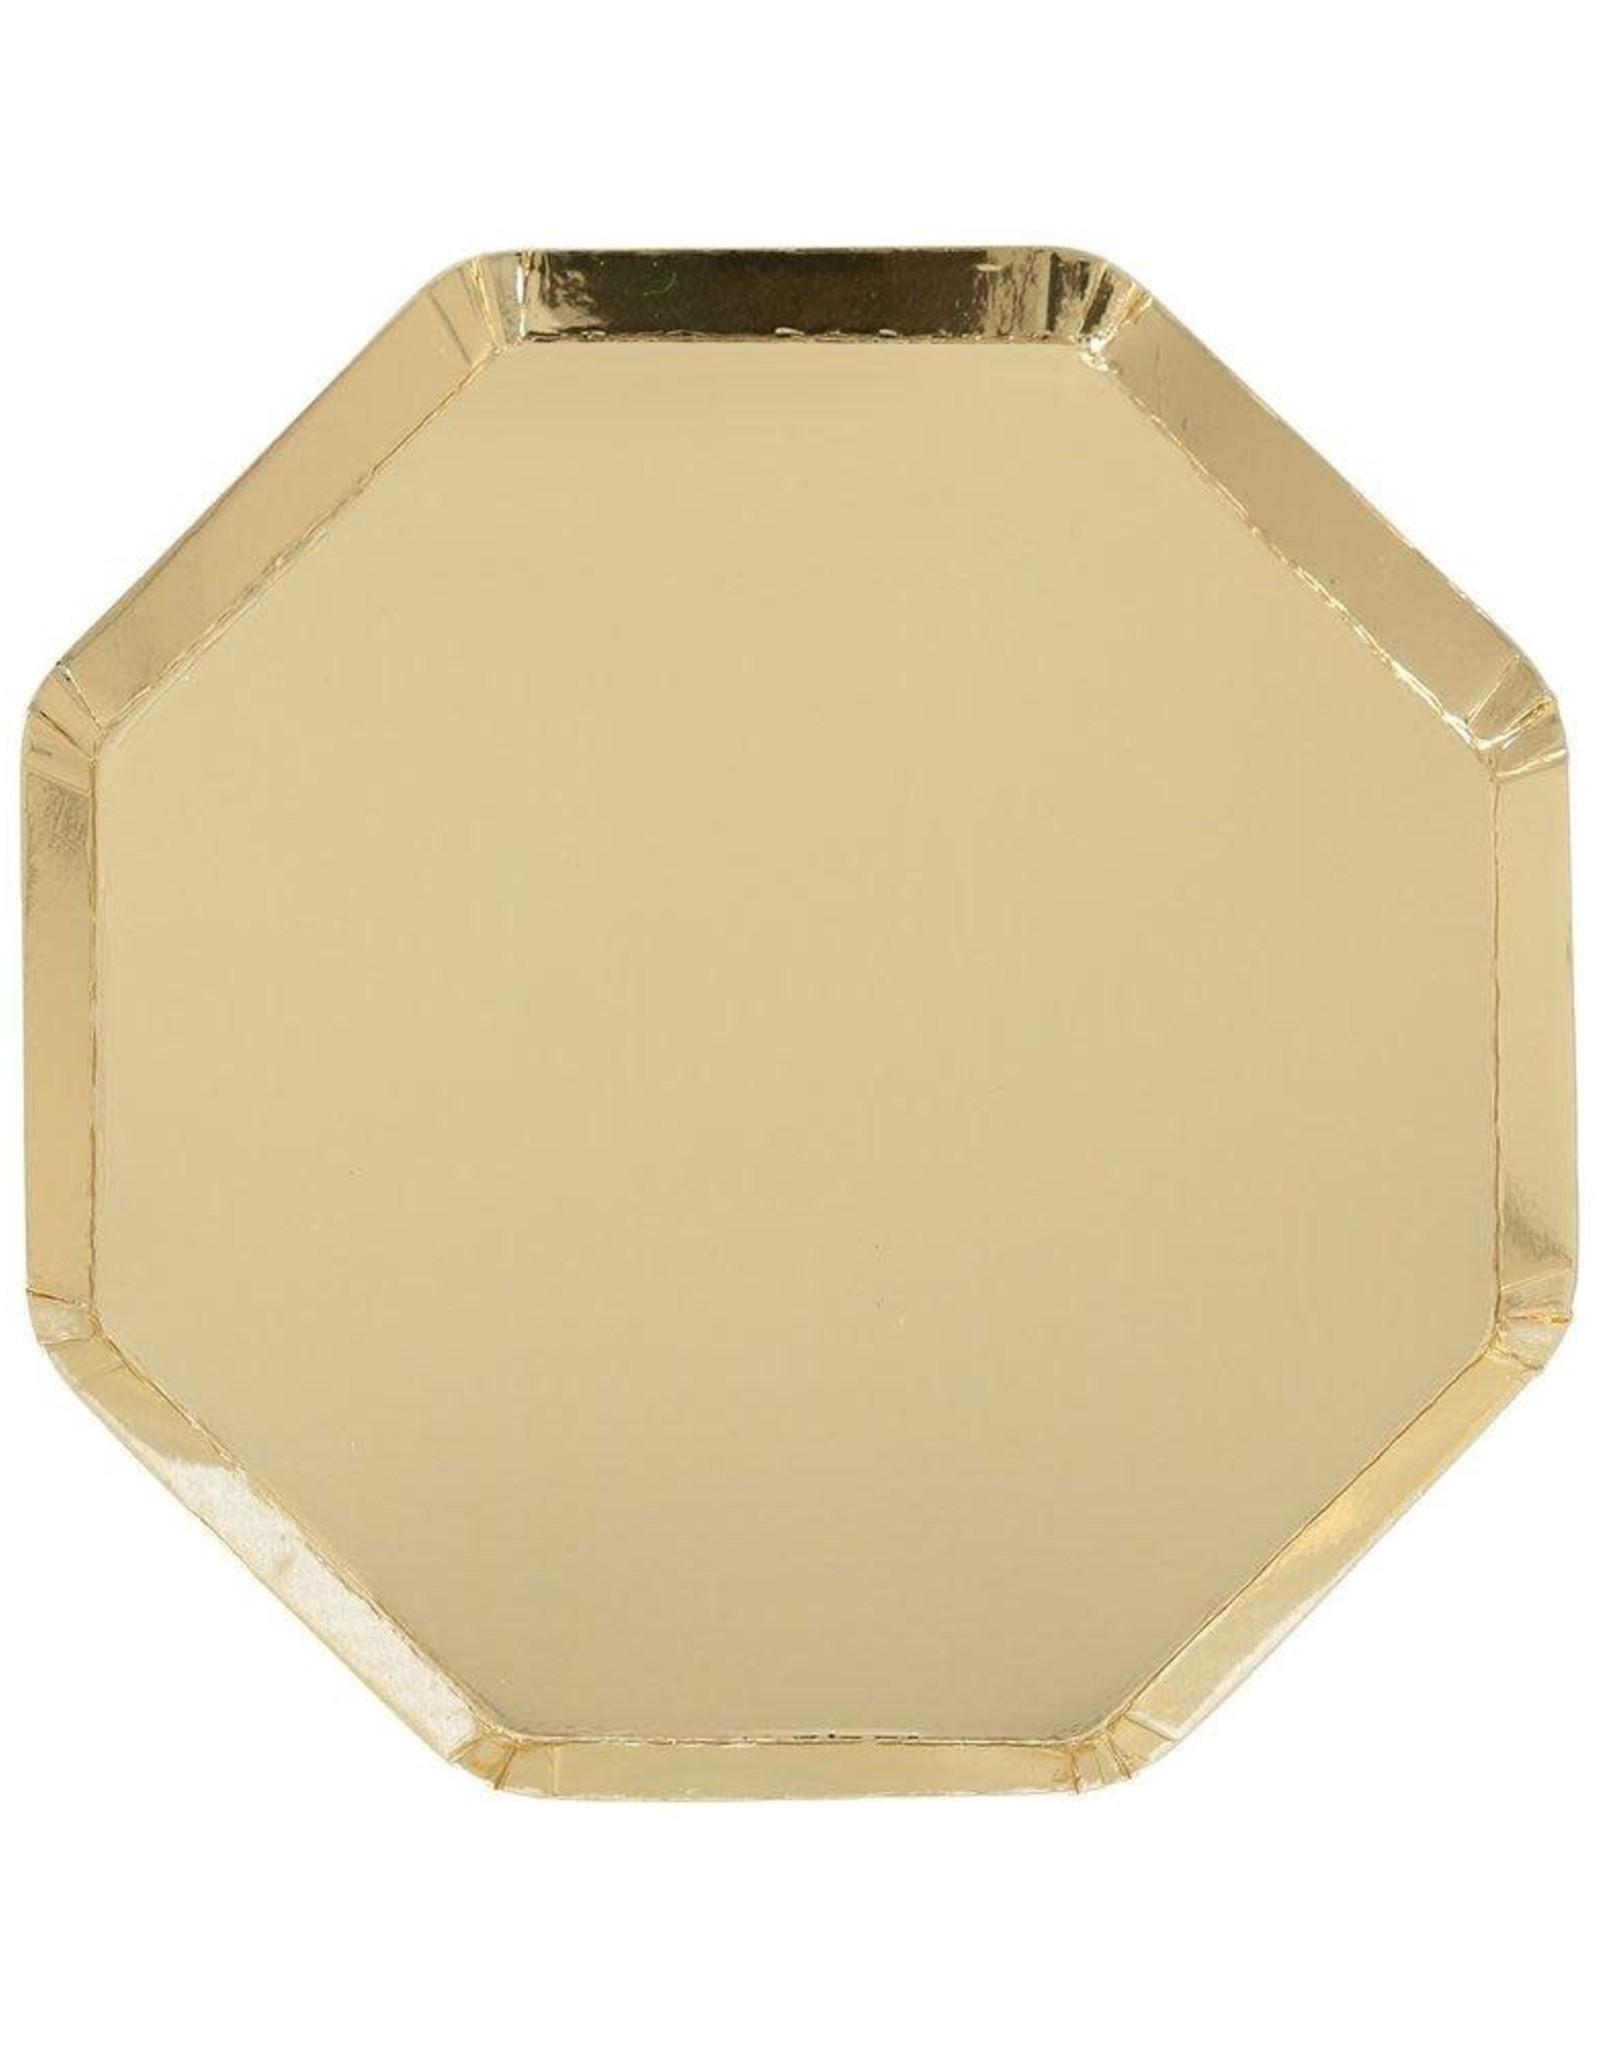 Meri Meri Meri Meri   Gold Side Plates (set of 8)